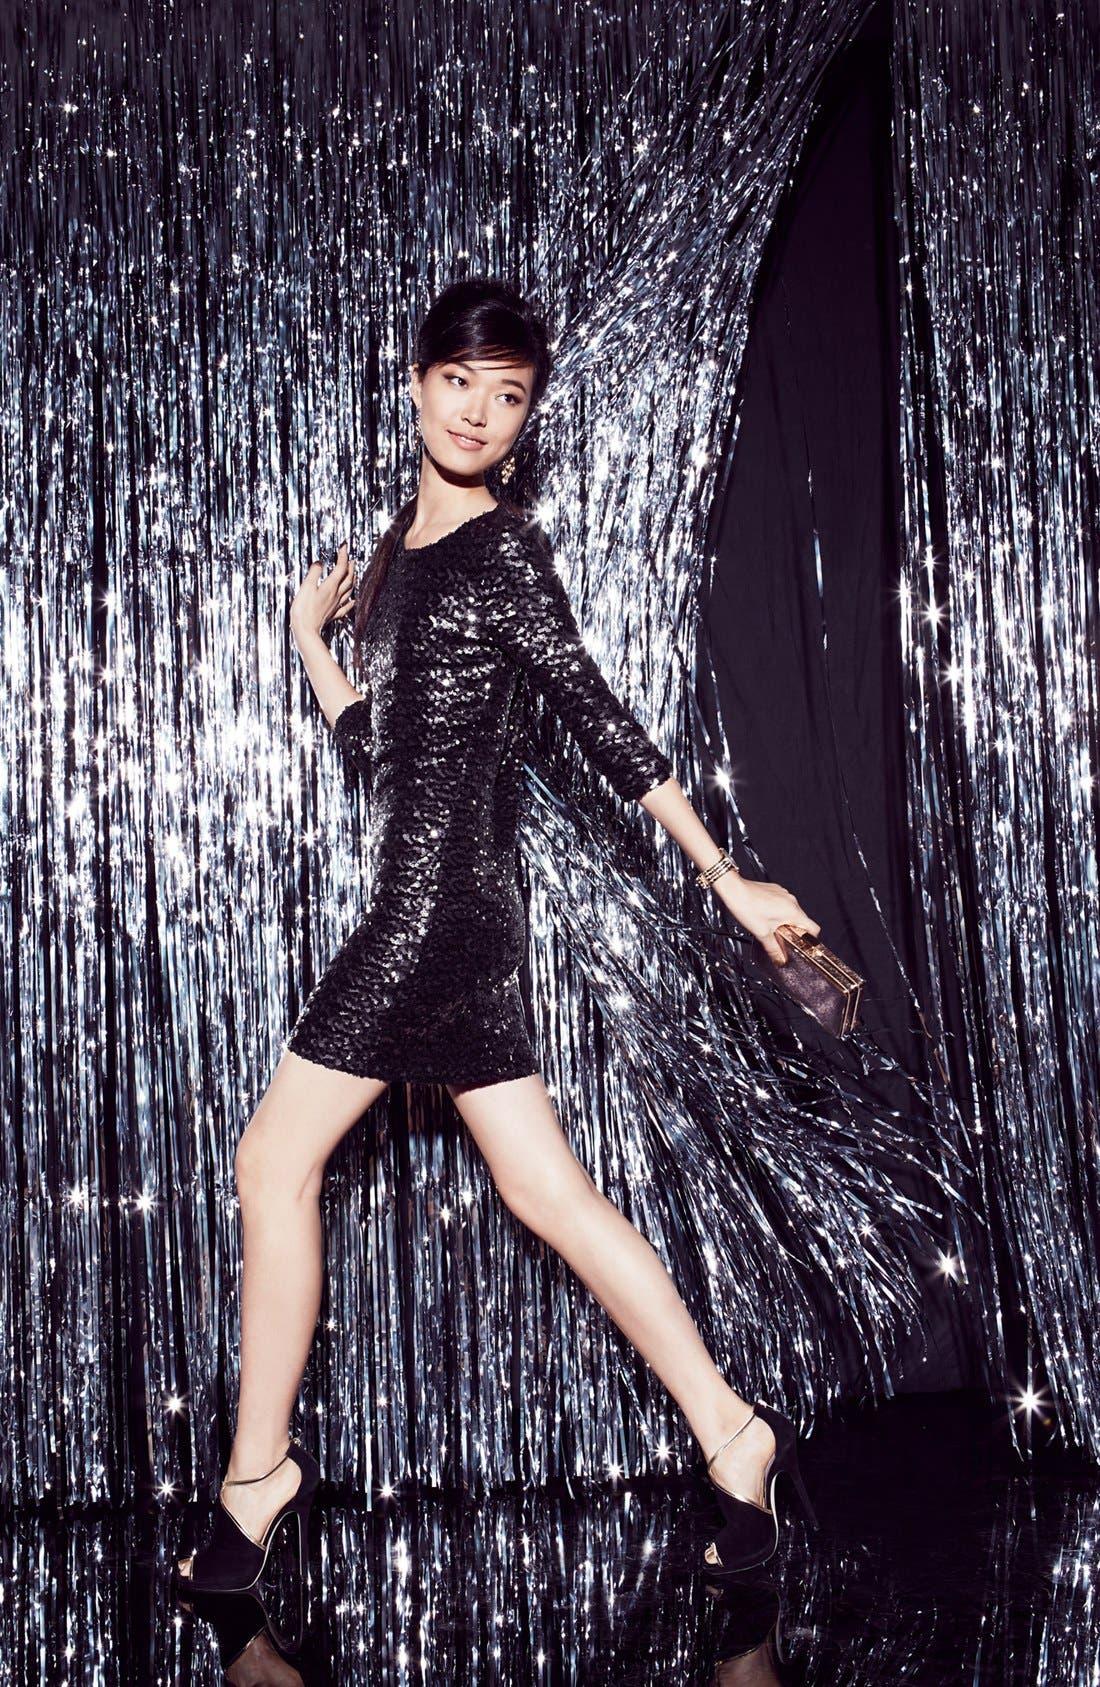 Alternate Image 1 Selected - BB Dakota Sequin Dress & Accessories